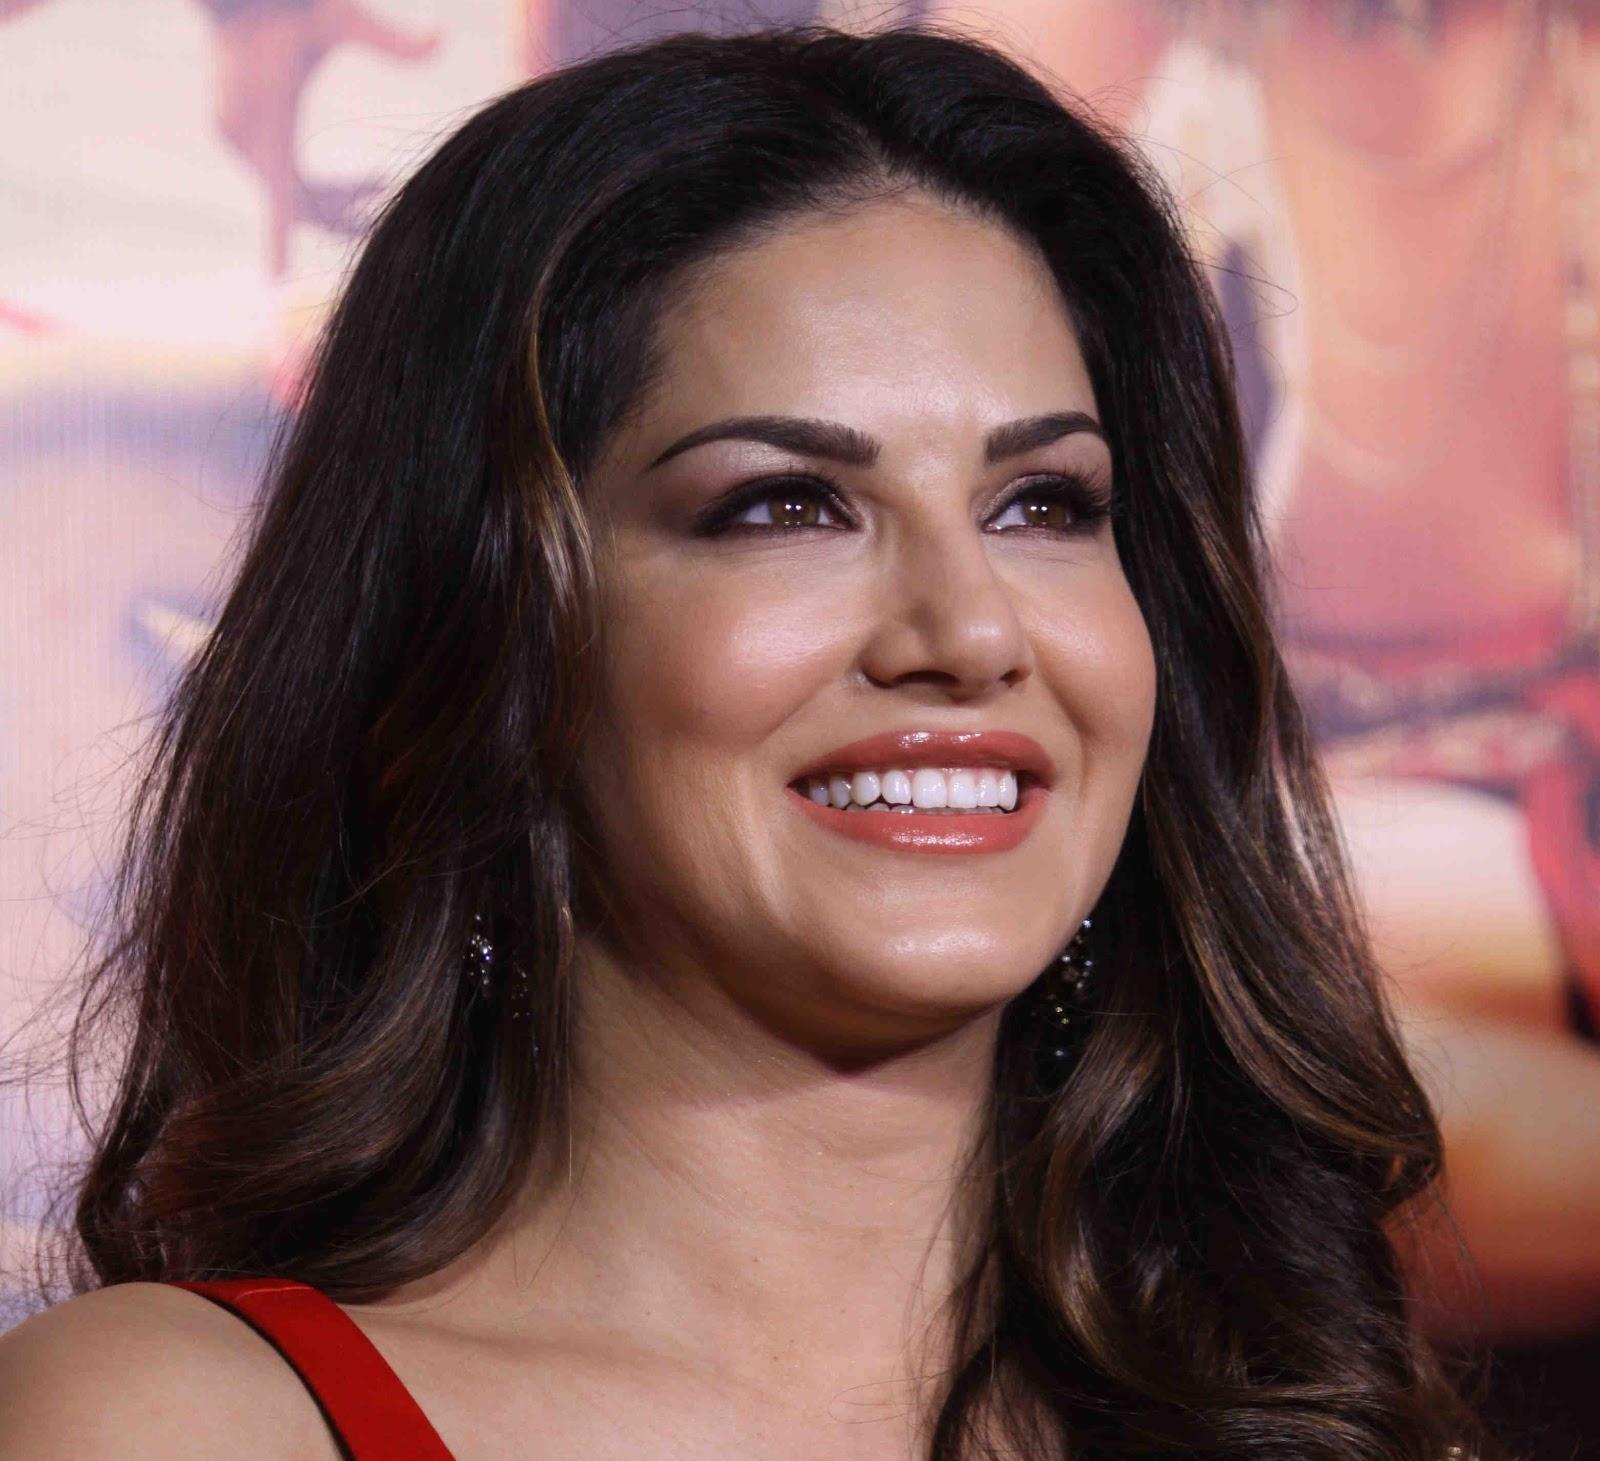 Fantastic Images of Ex Porn Star actress Sunny Leone